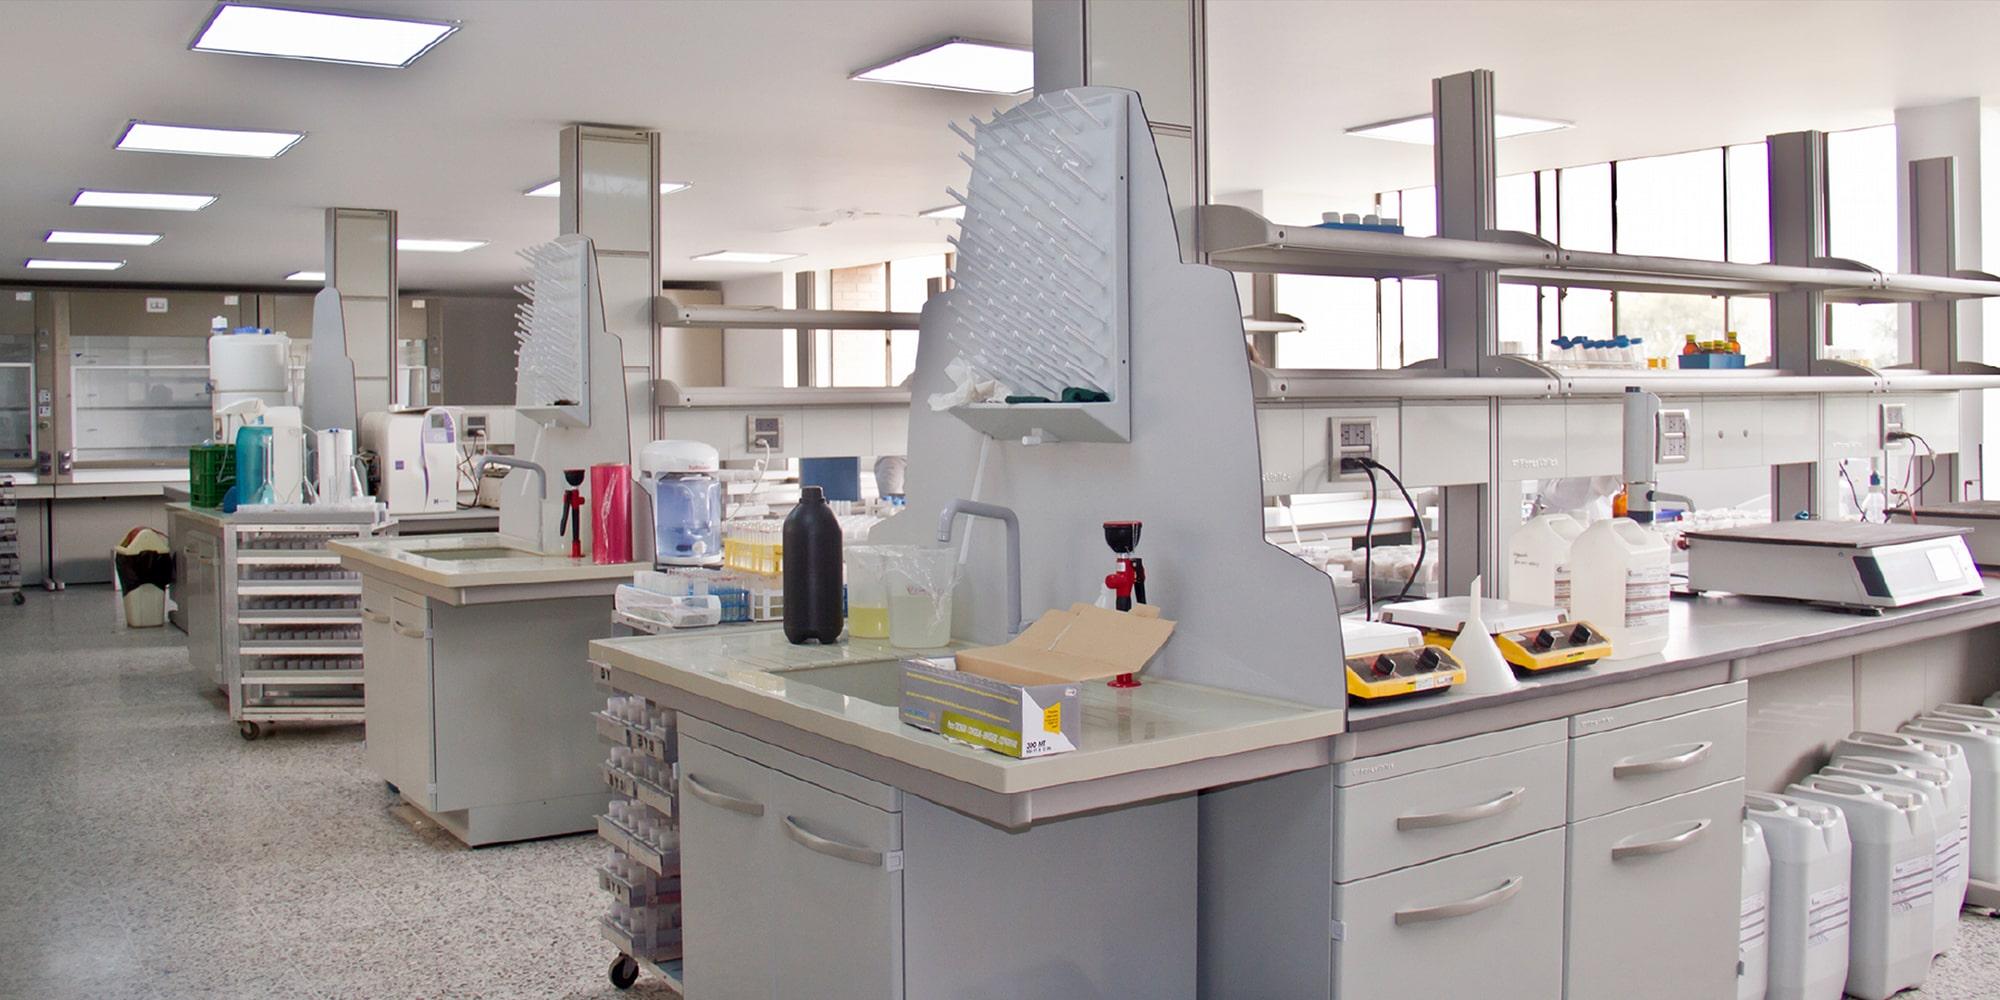 Laboratoris Corpoica a Bogotà